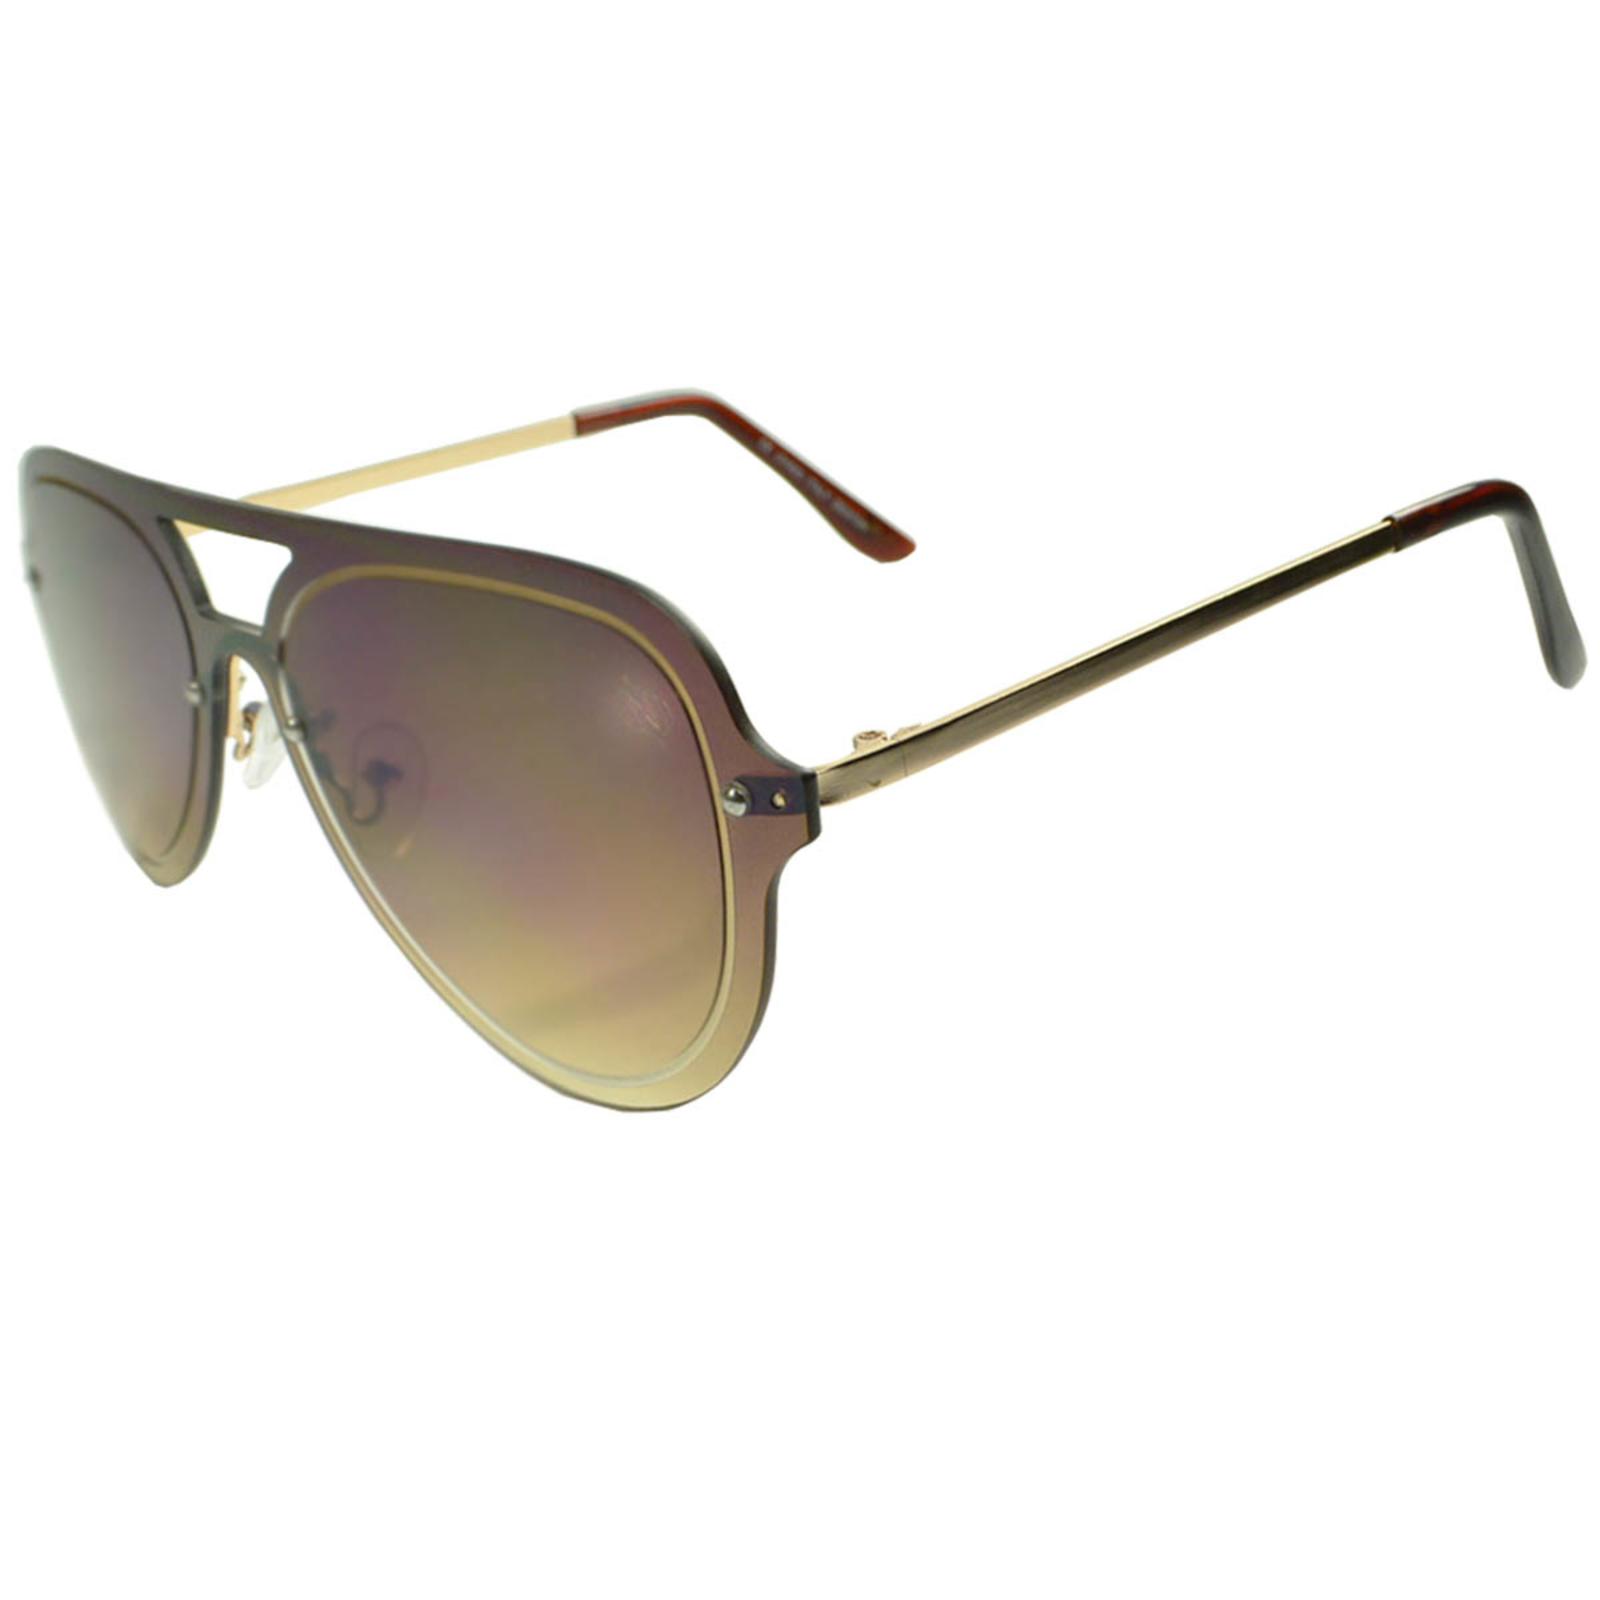 Óculos De Sol Mackage Unissex Aviador Rimless - Marrom